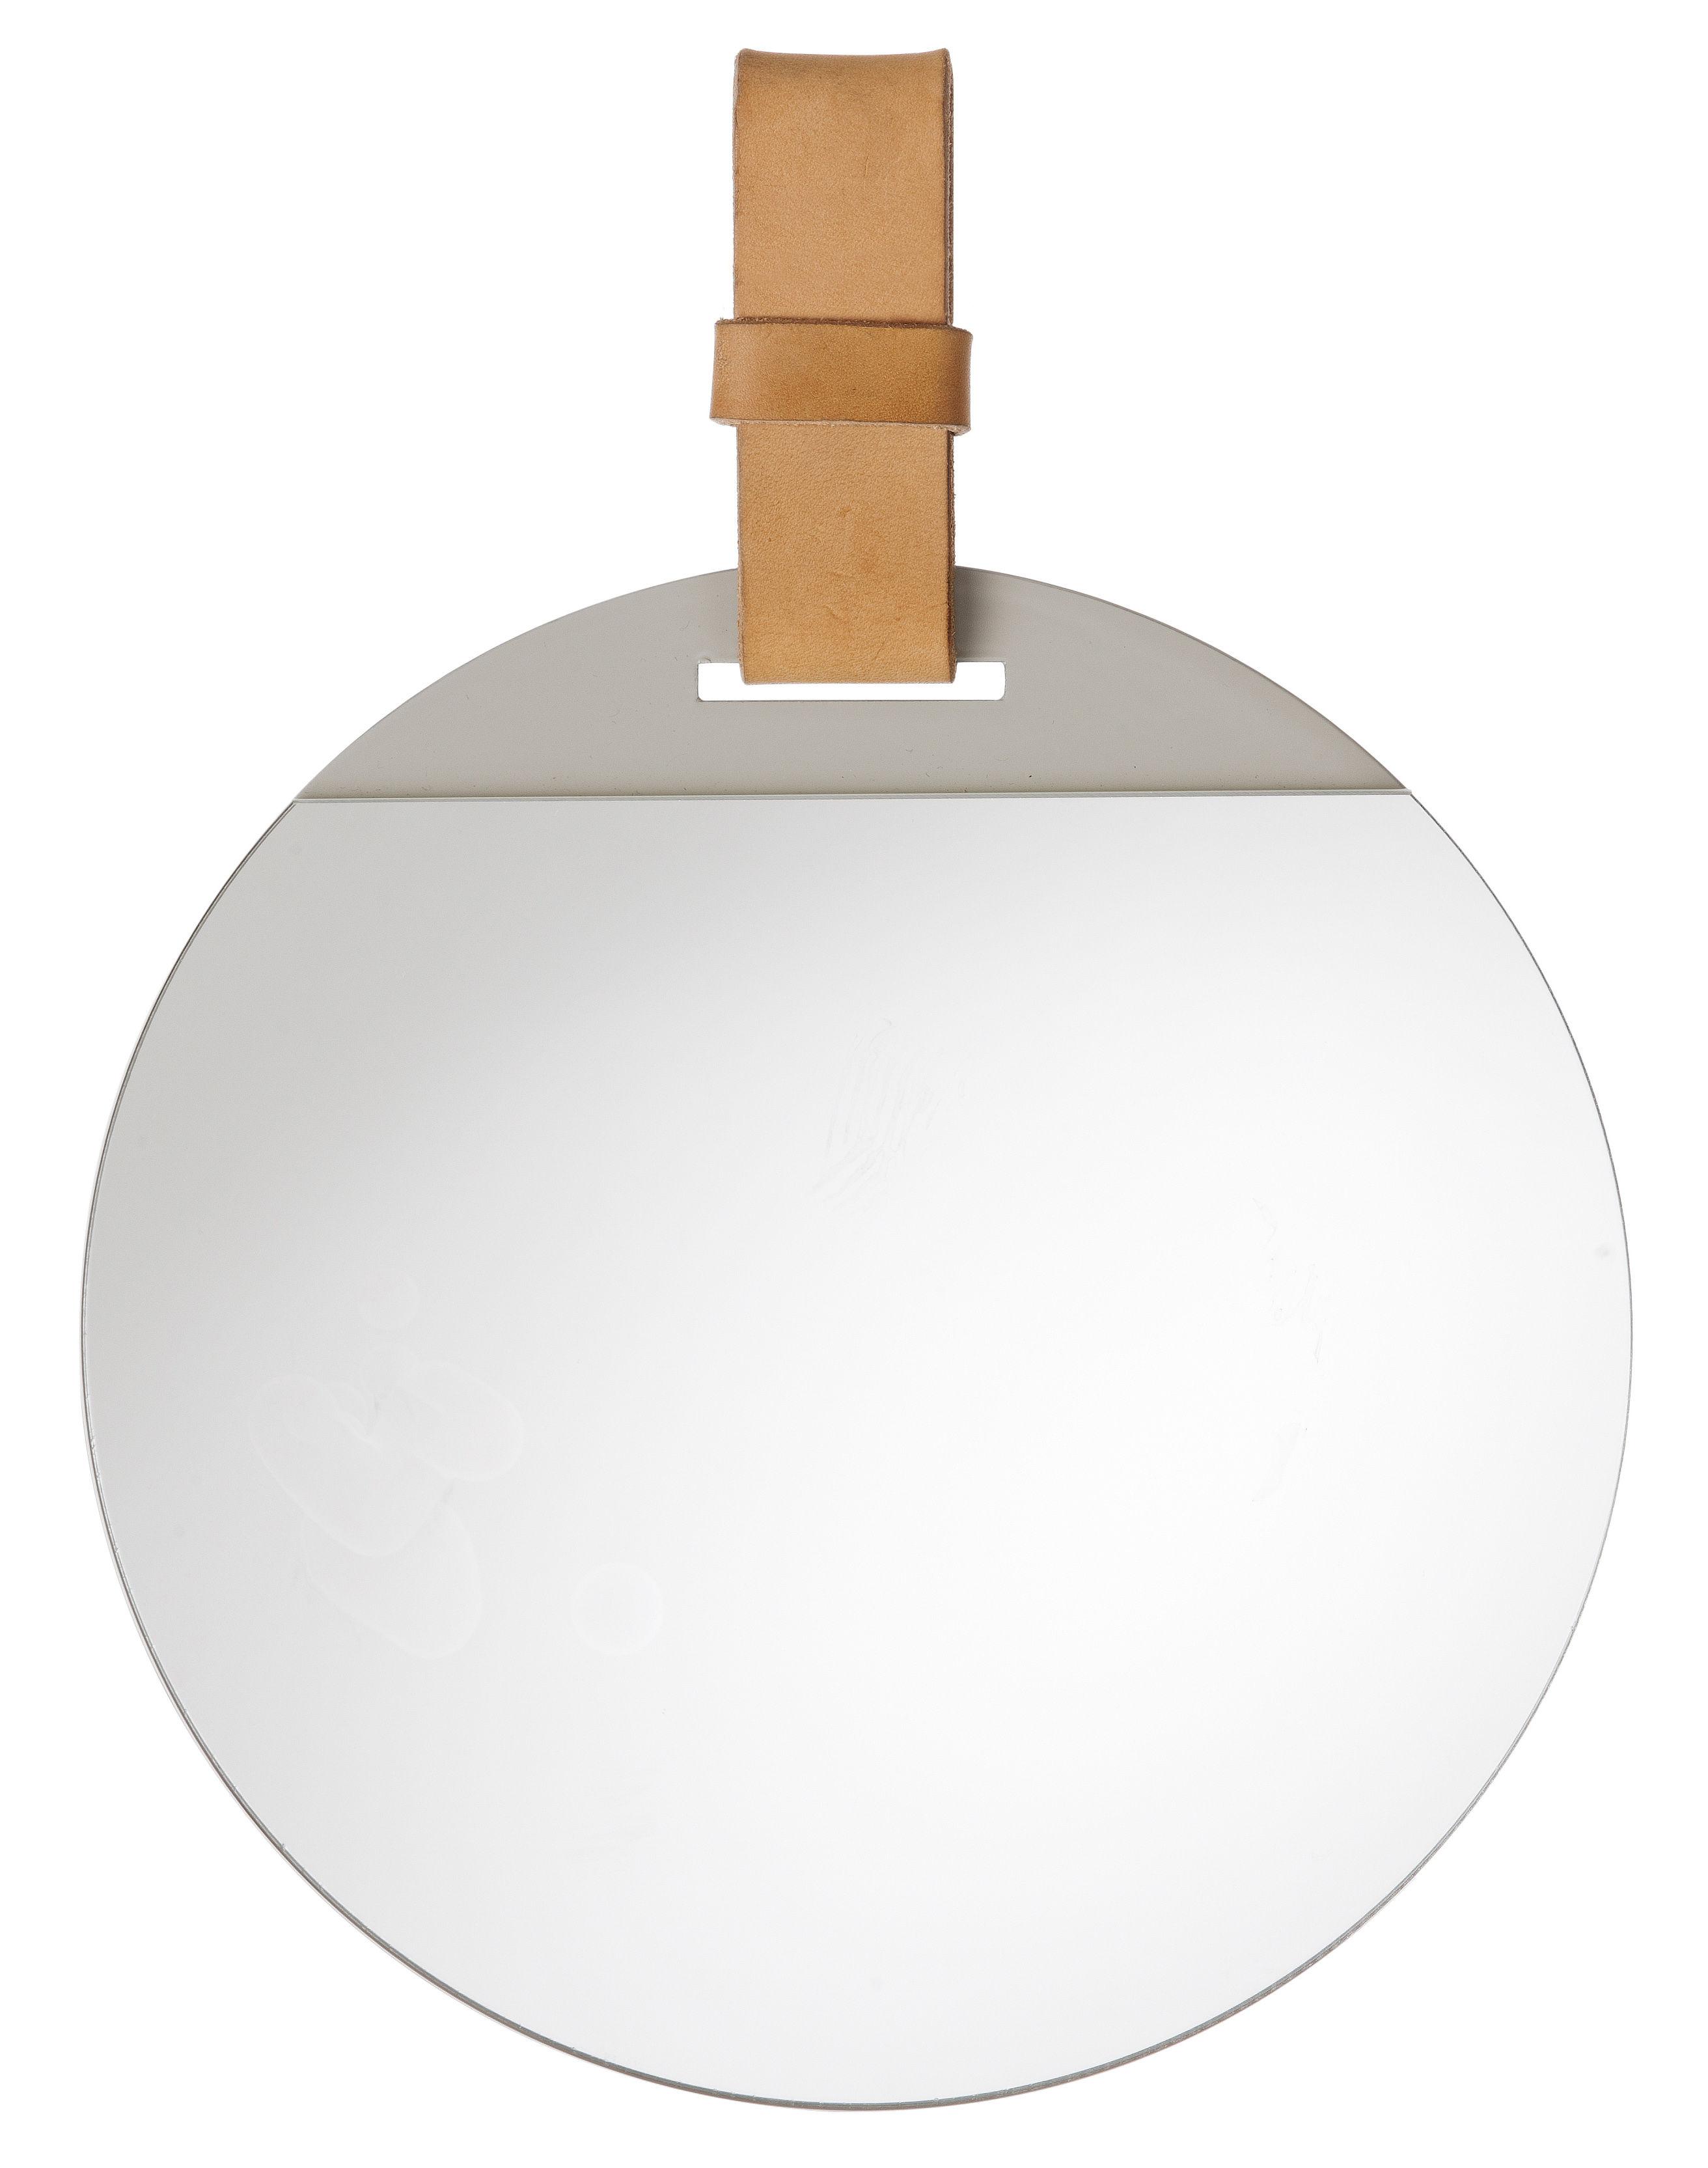 Déco - Miroirs - Miroir mural Enter / Ø 26 cm - Cuir - Ferm Living - Cuir naturel - Cuir, Métal peint, Verre